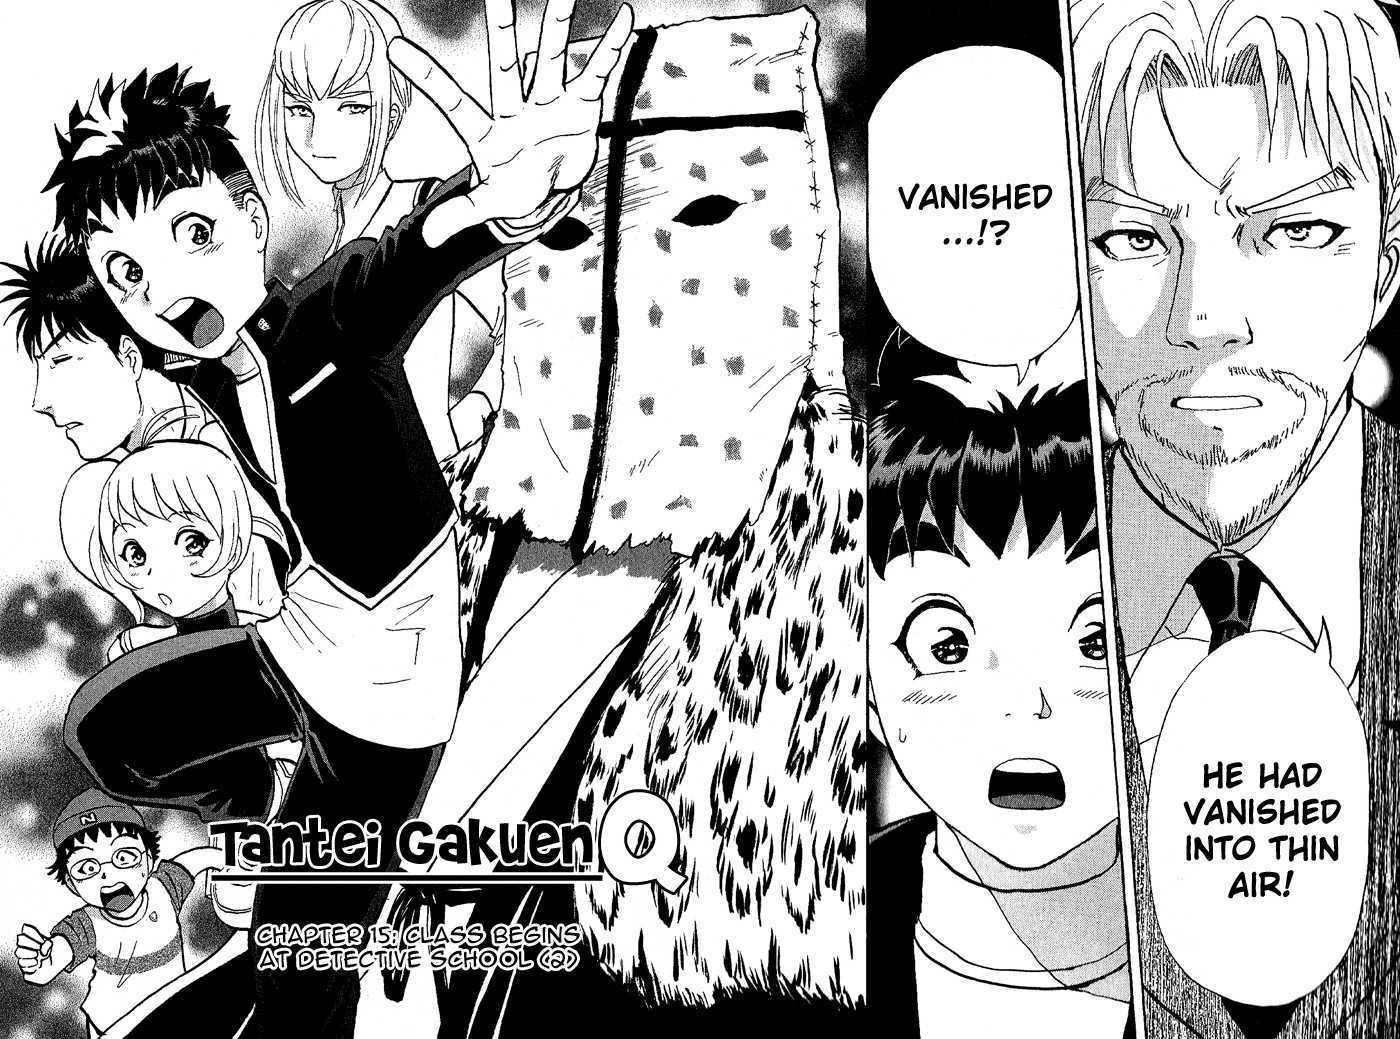 Tantei Gakuen Q 15 Page 3